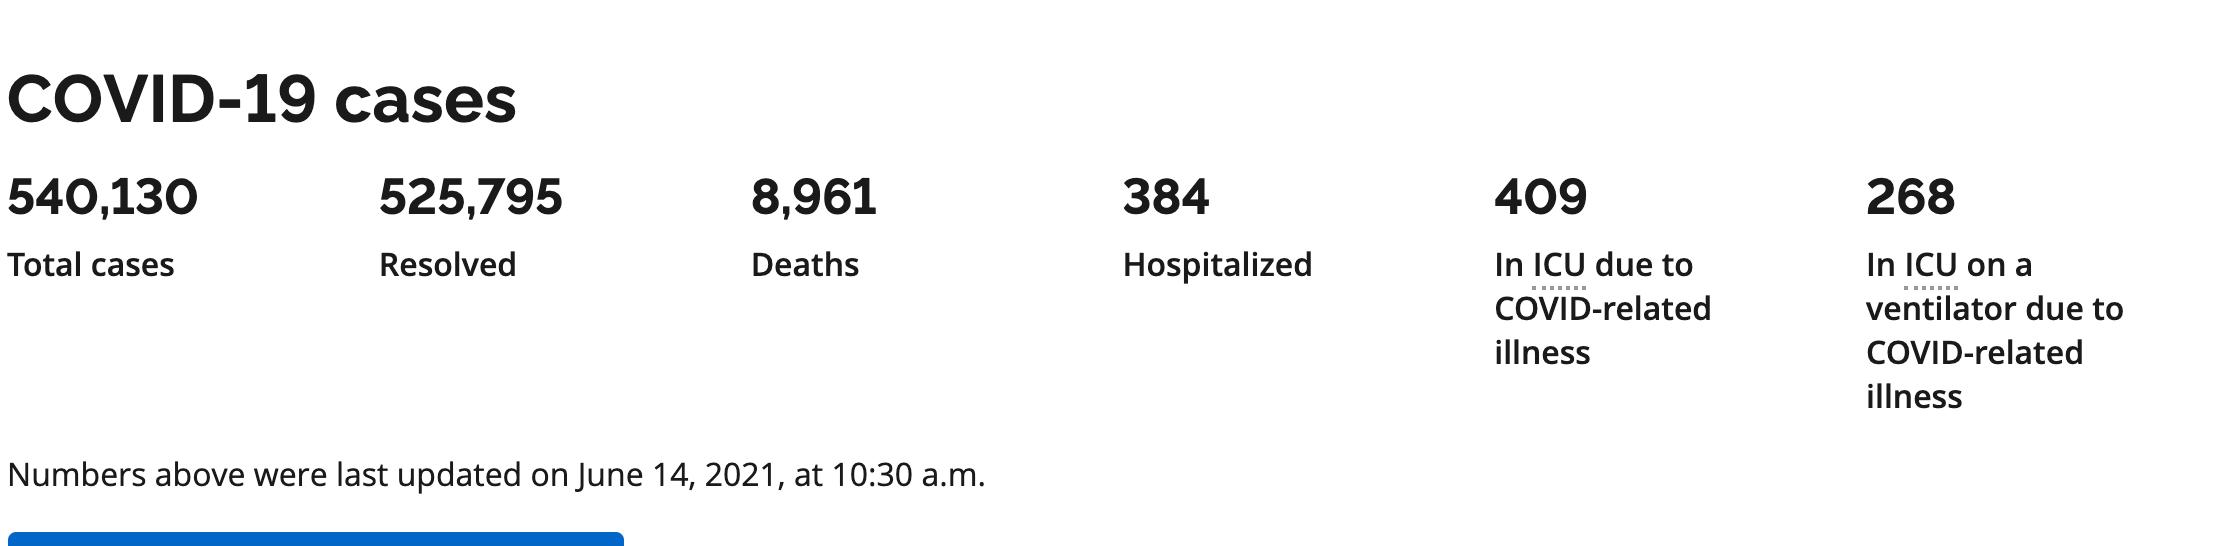 COVID-19 cases hospitalization